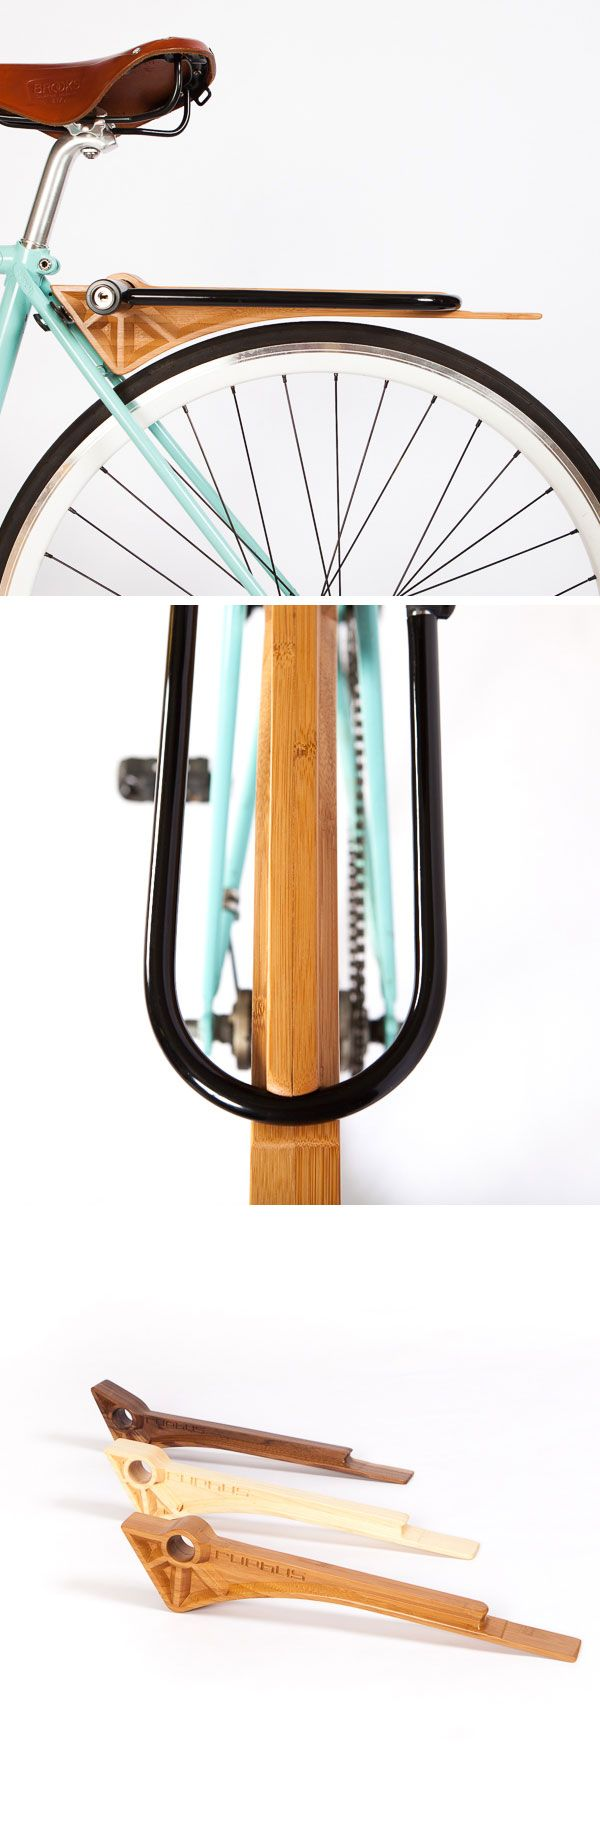 Nicely designed Ruphus Slim wood fender, rack + lock holder all in one.